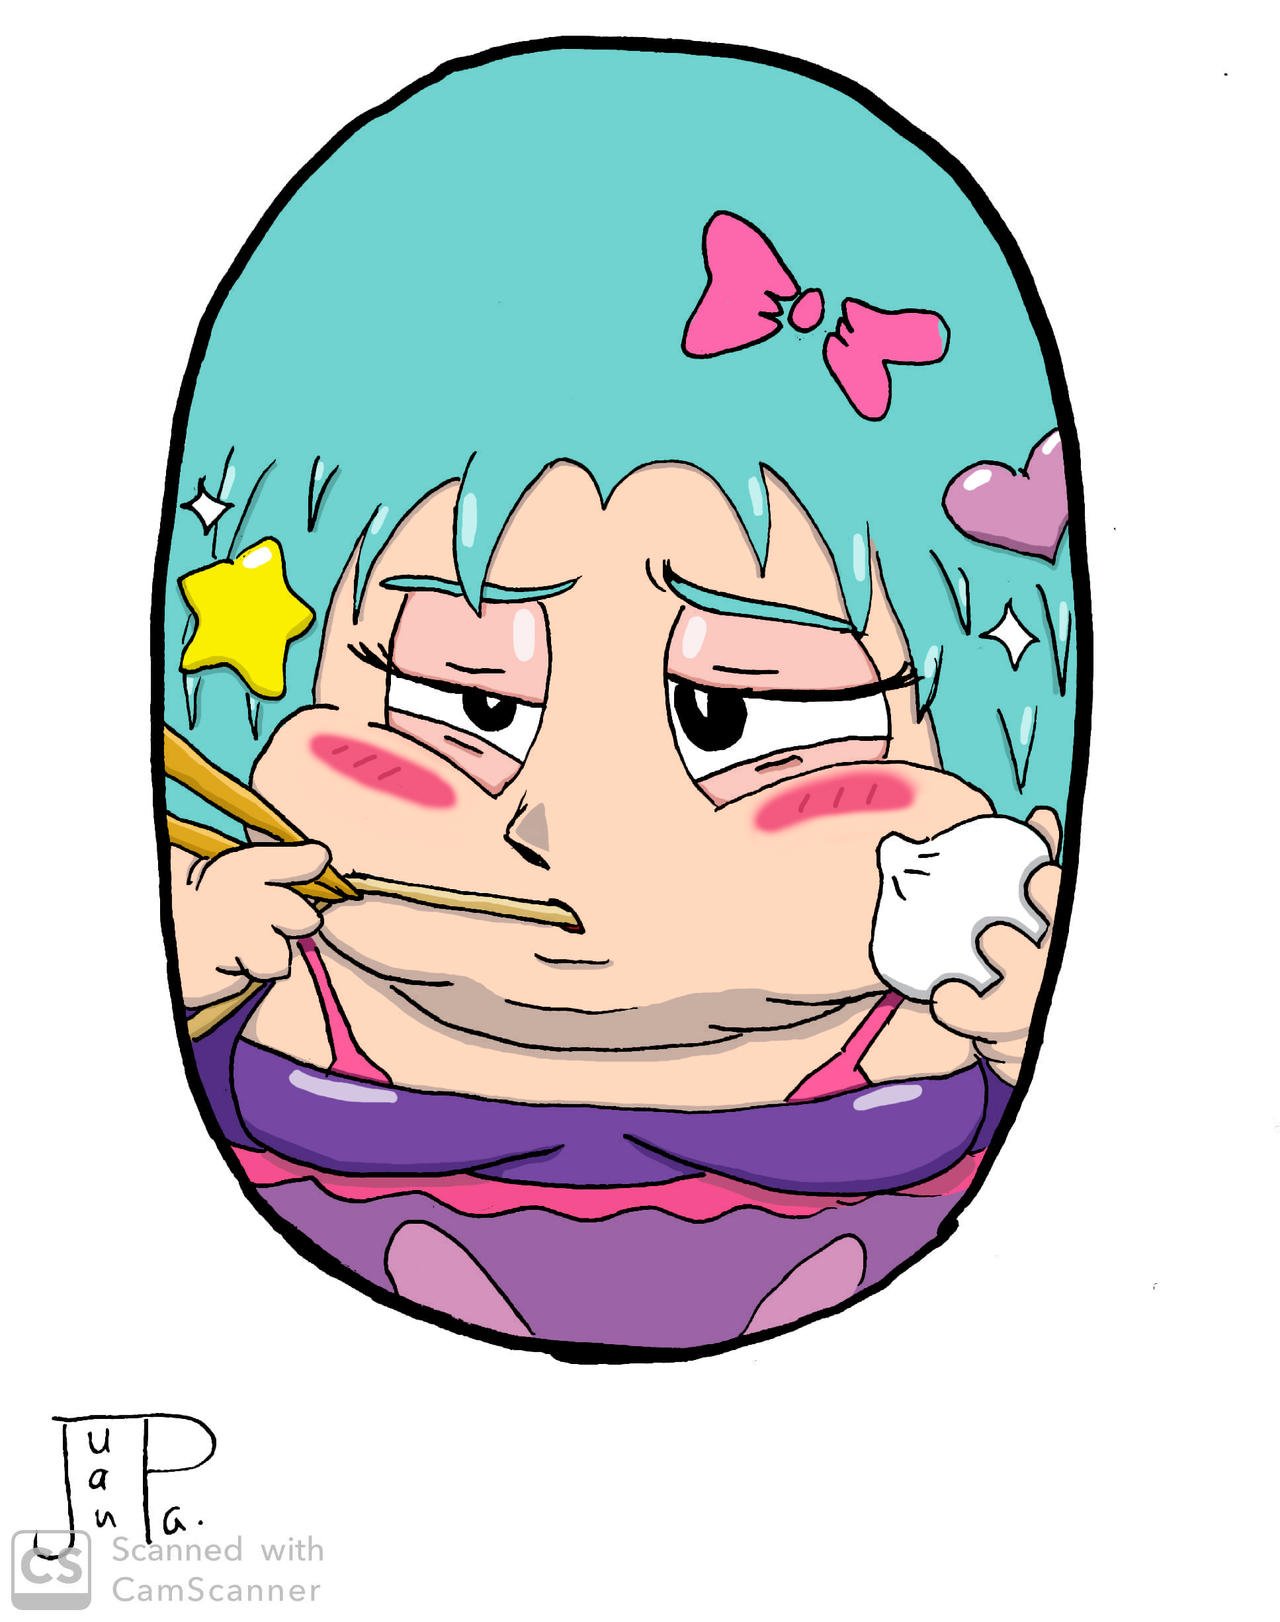 Mighty Beanz OC - Fat Anime Girl by JuanpaDraws on DeviantArt